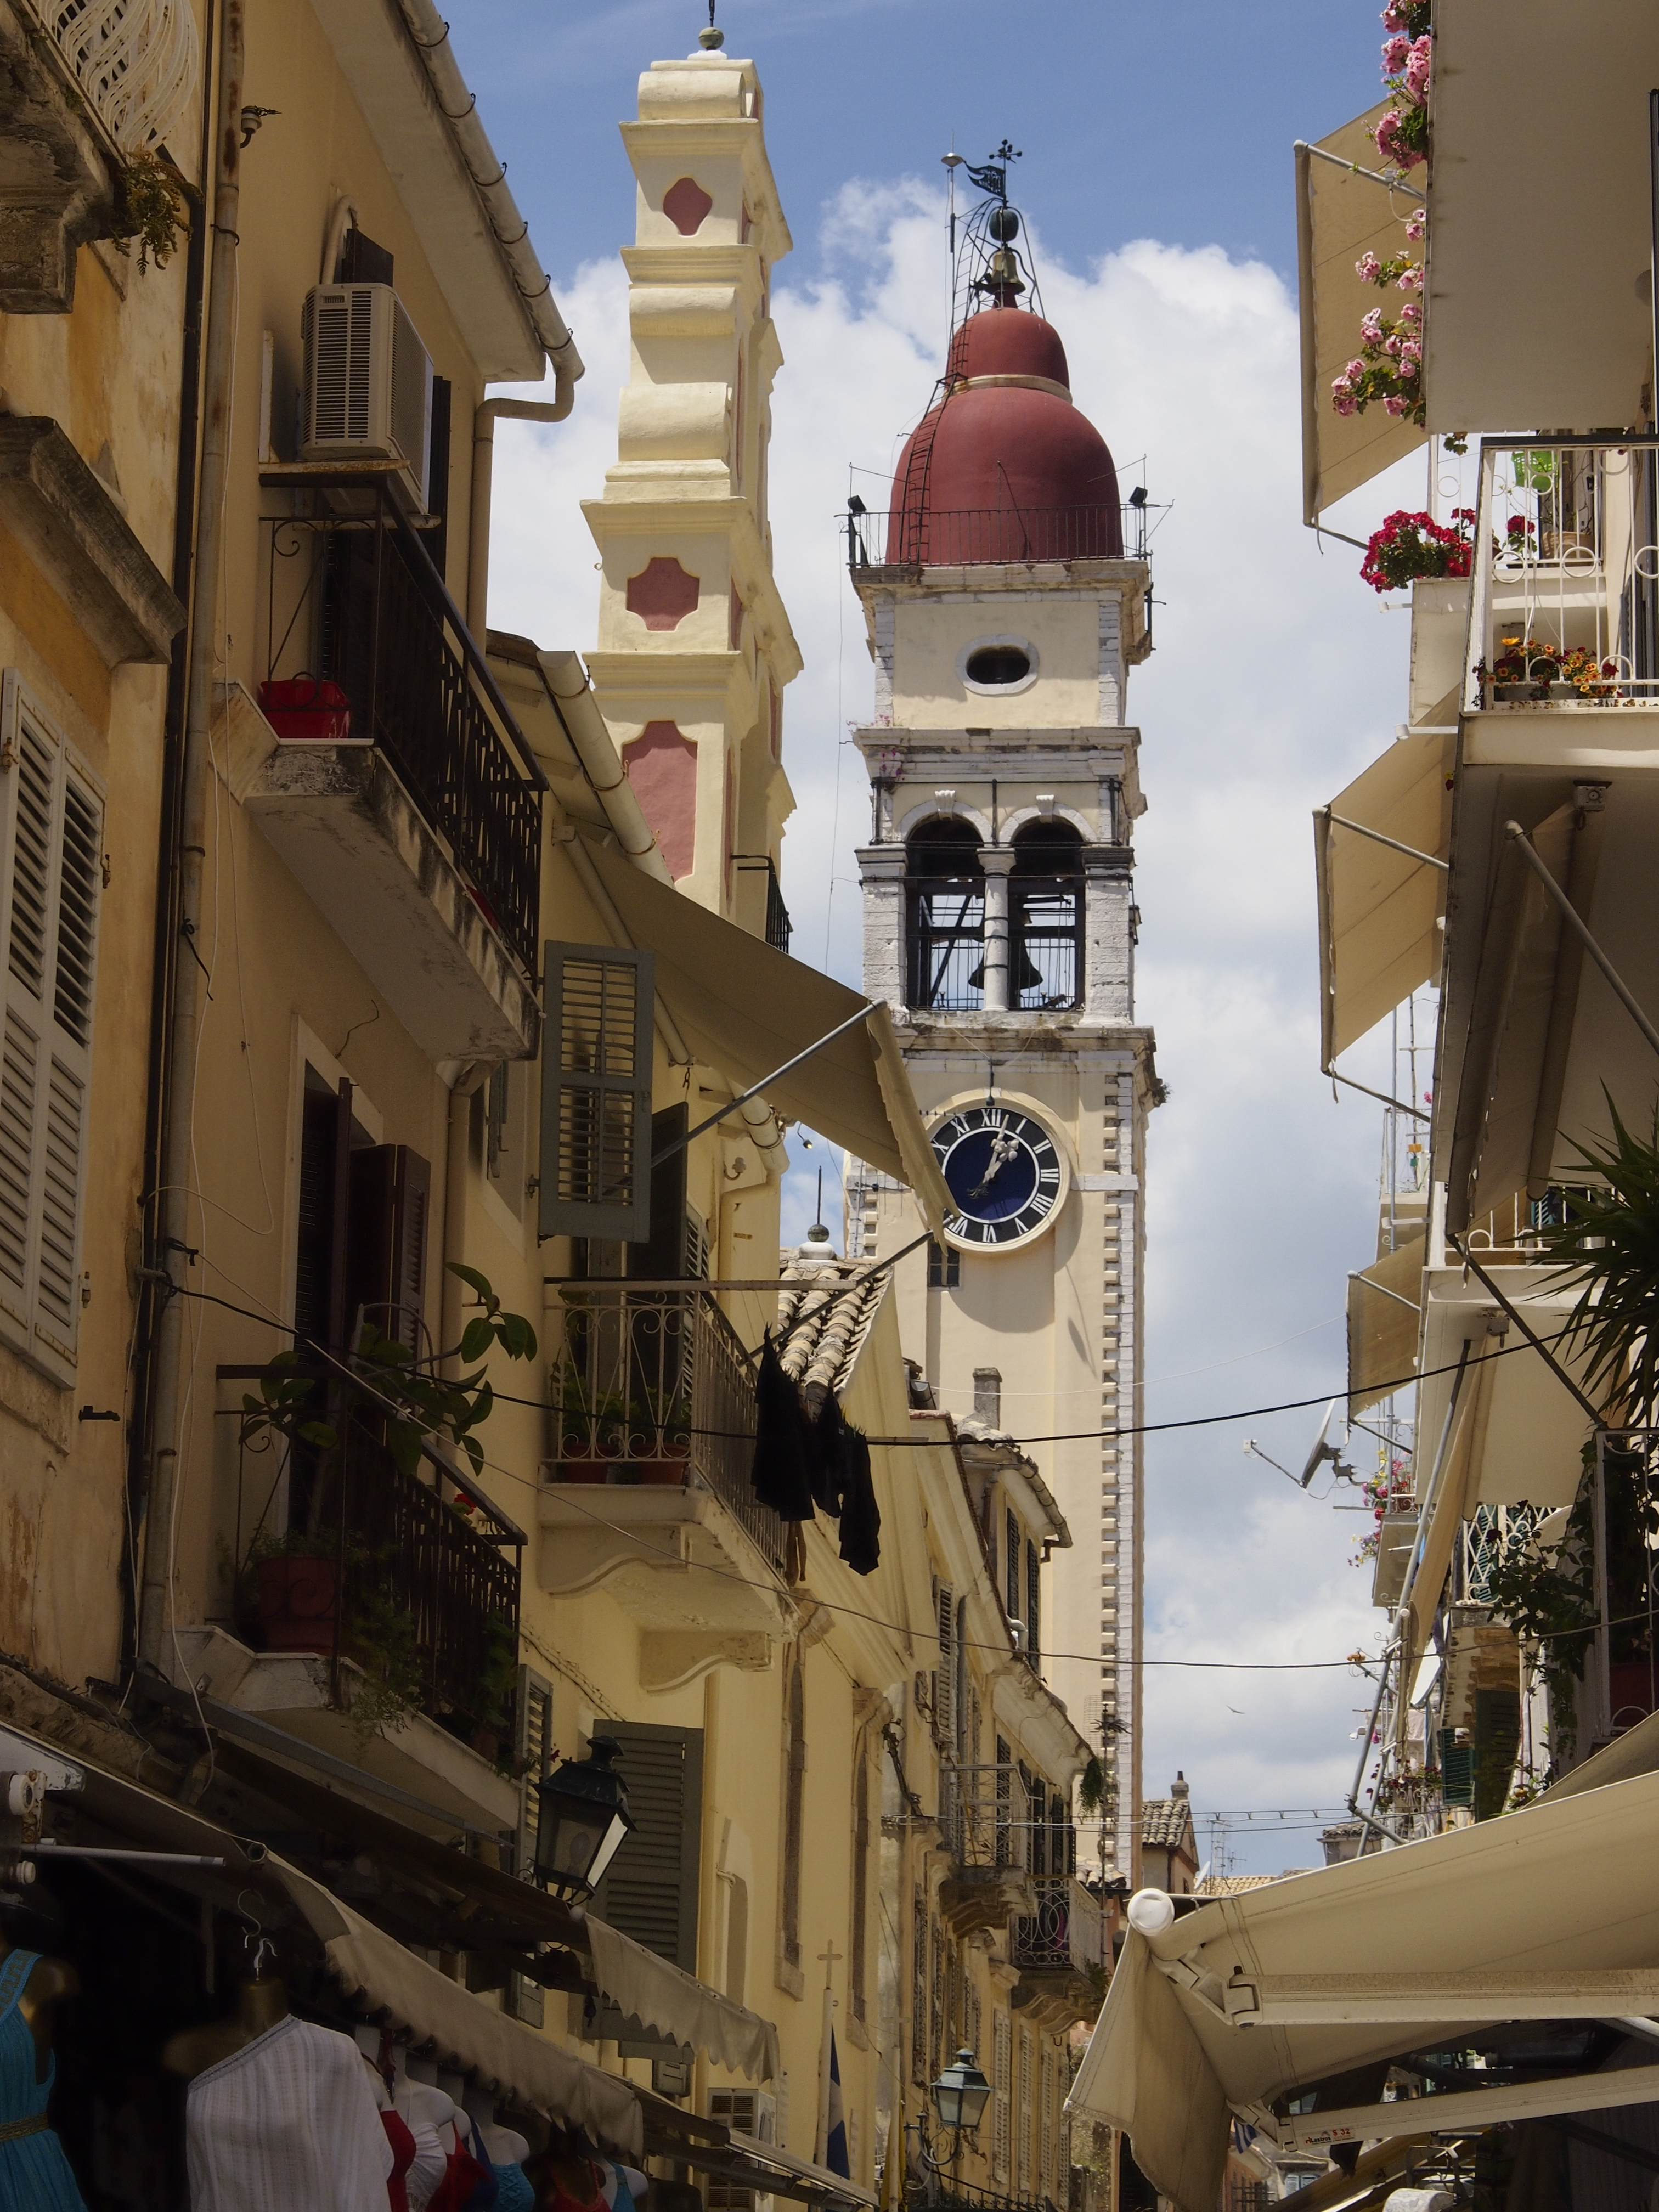 File:Saint Spyridon church Korfu.jpg - Wikimedia Commons